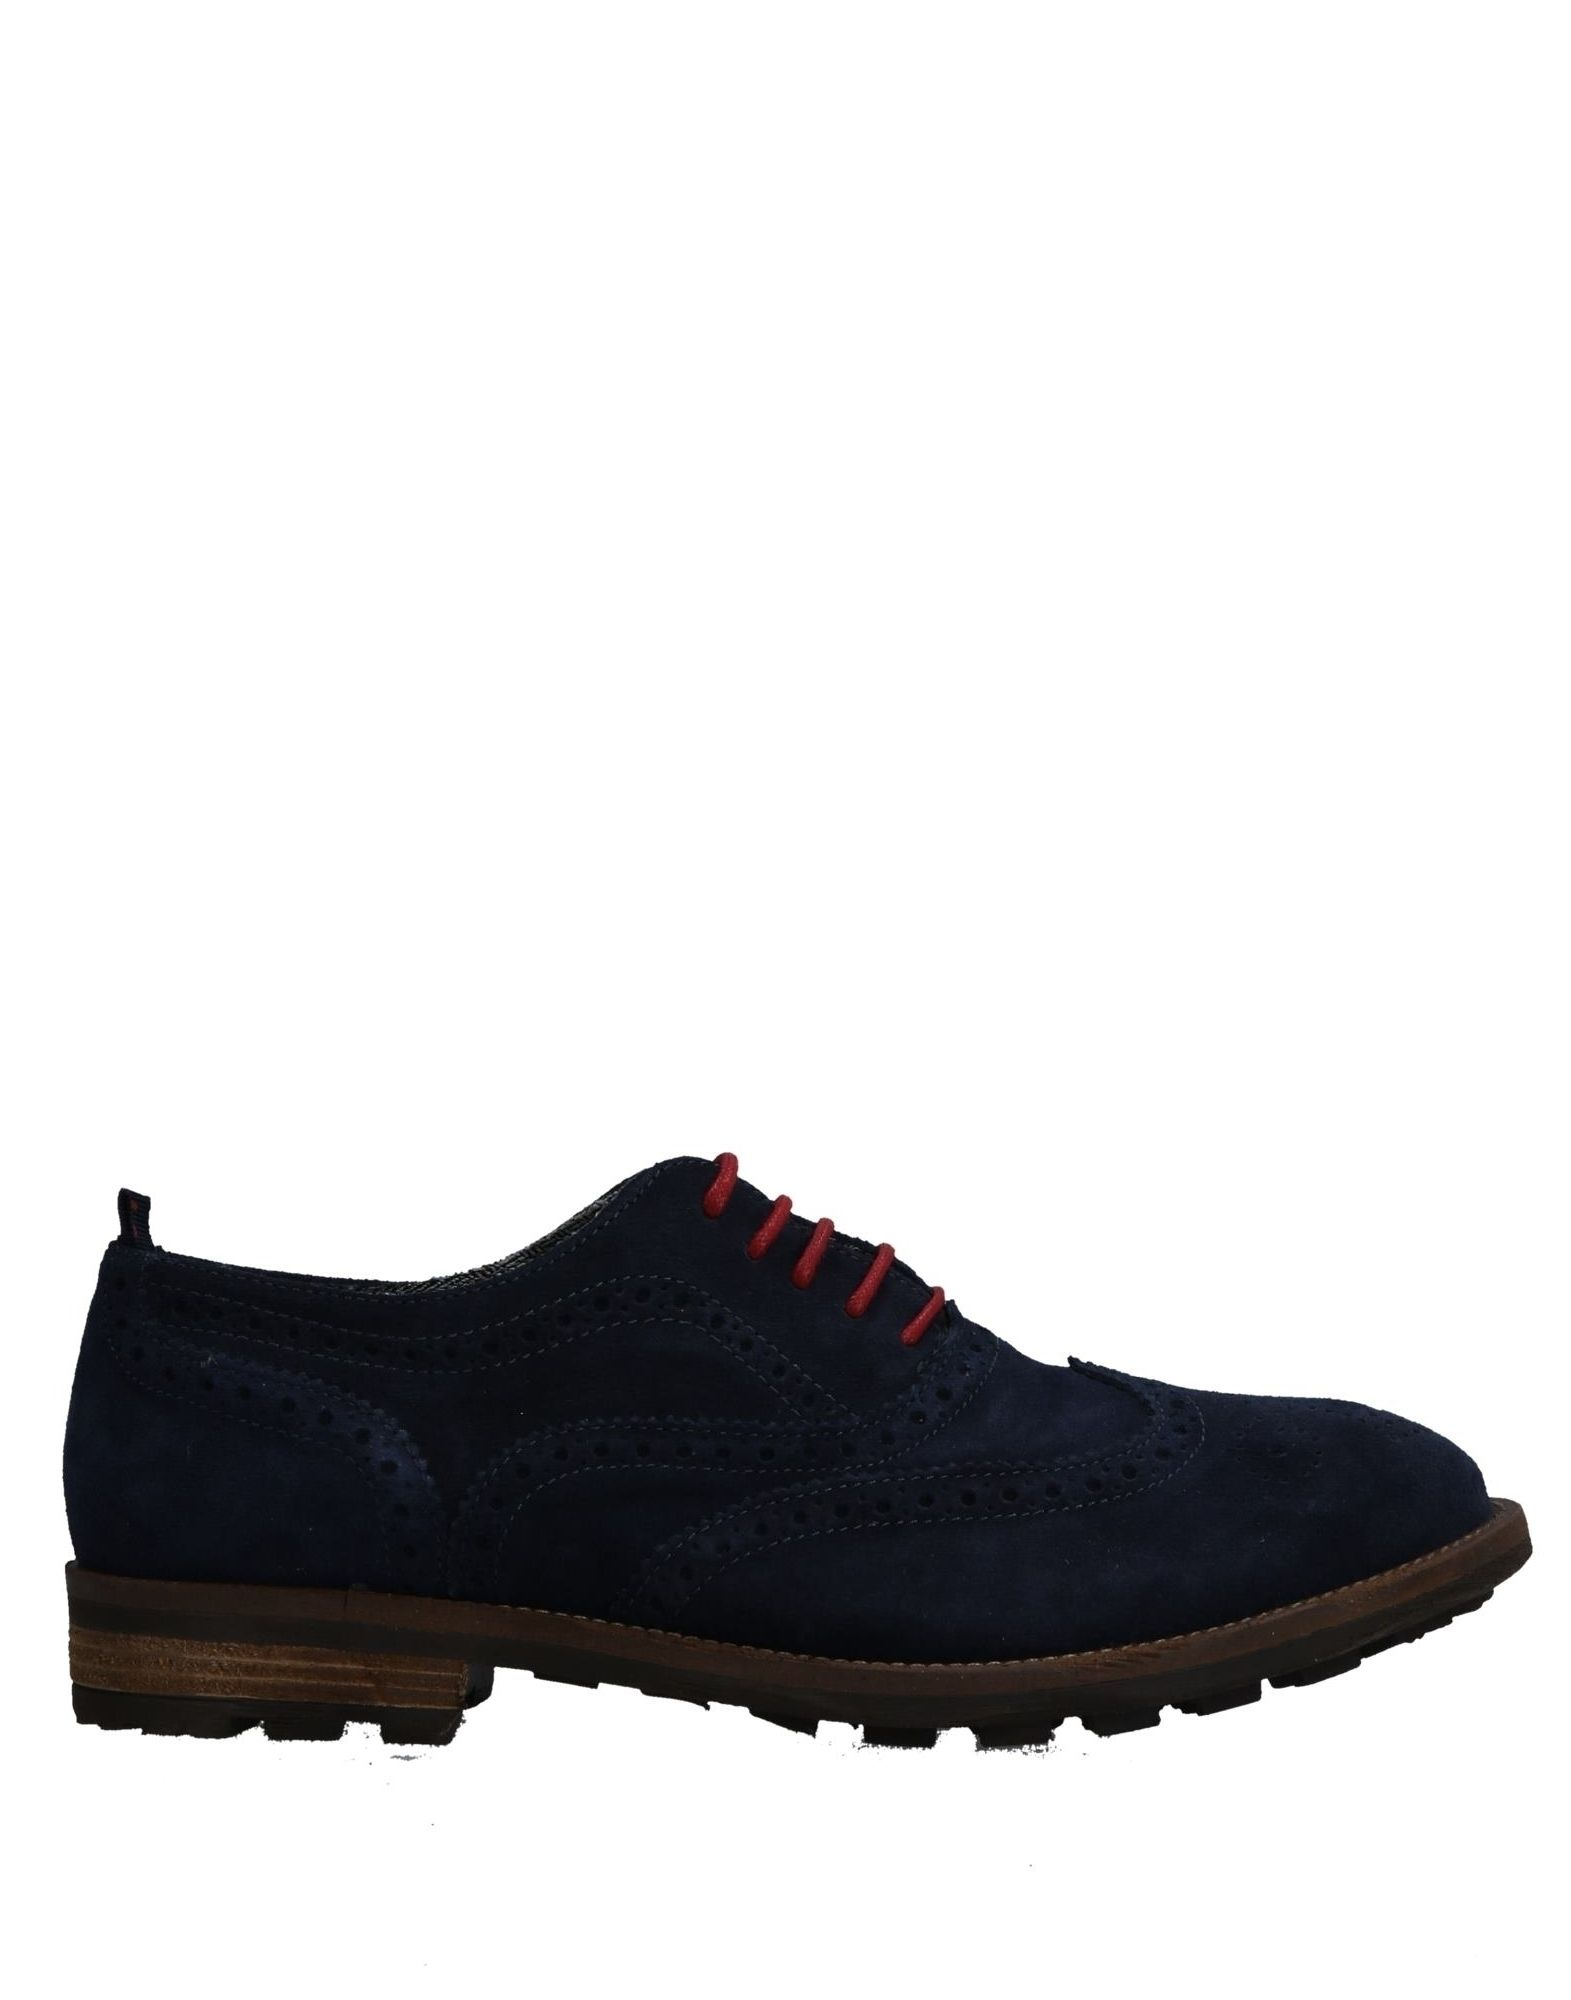 Rabatt echte Schuhe Snobs® Schnürschuhe Herren  11523827TK